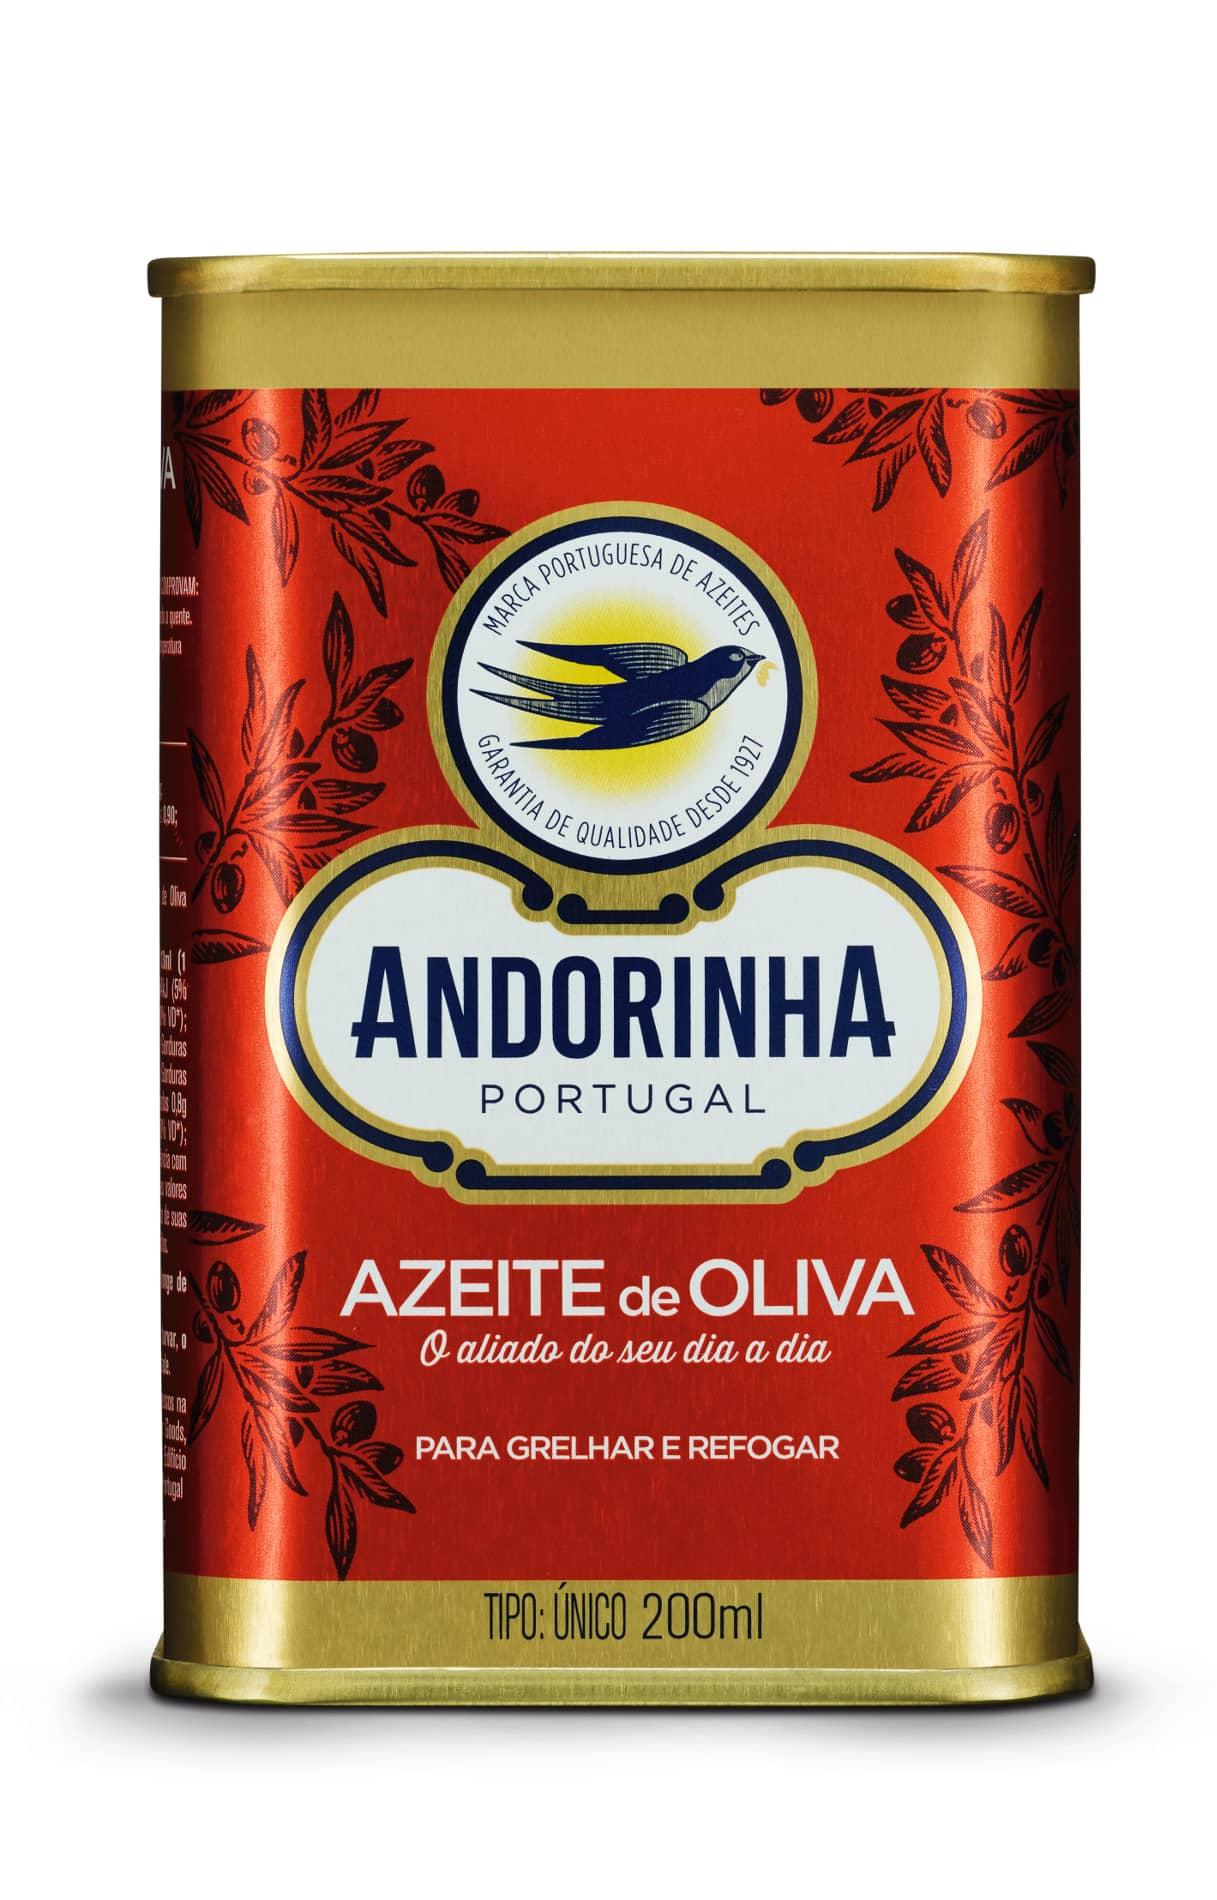 Andorinha-Lata-200ml